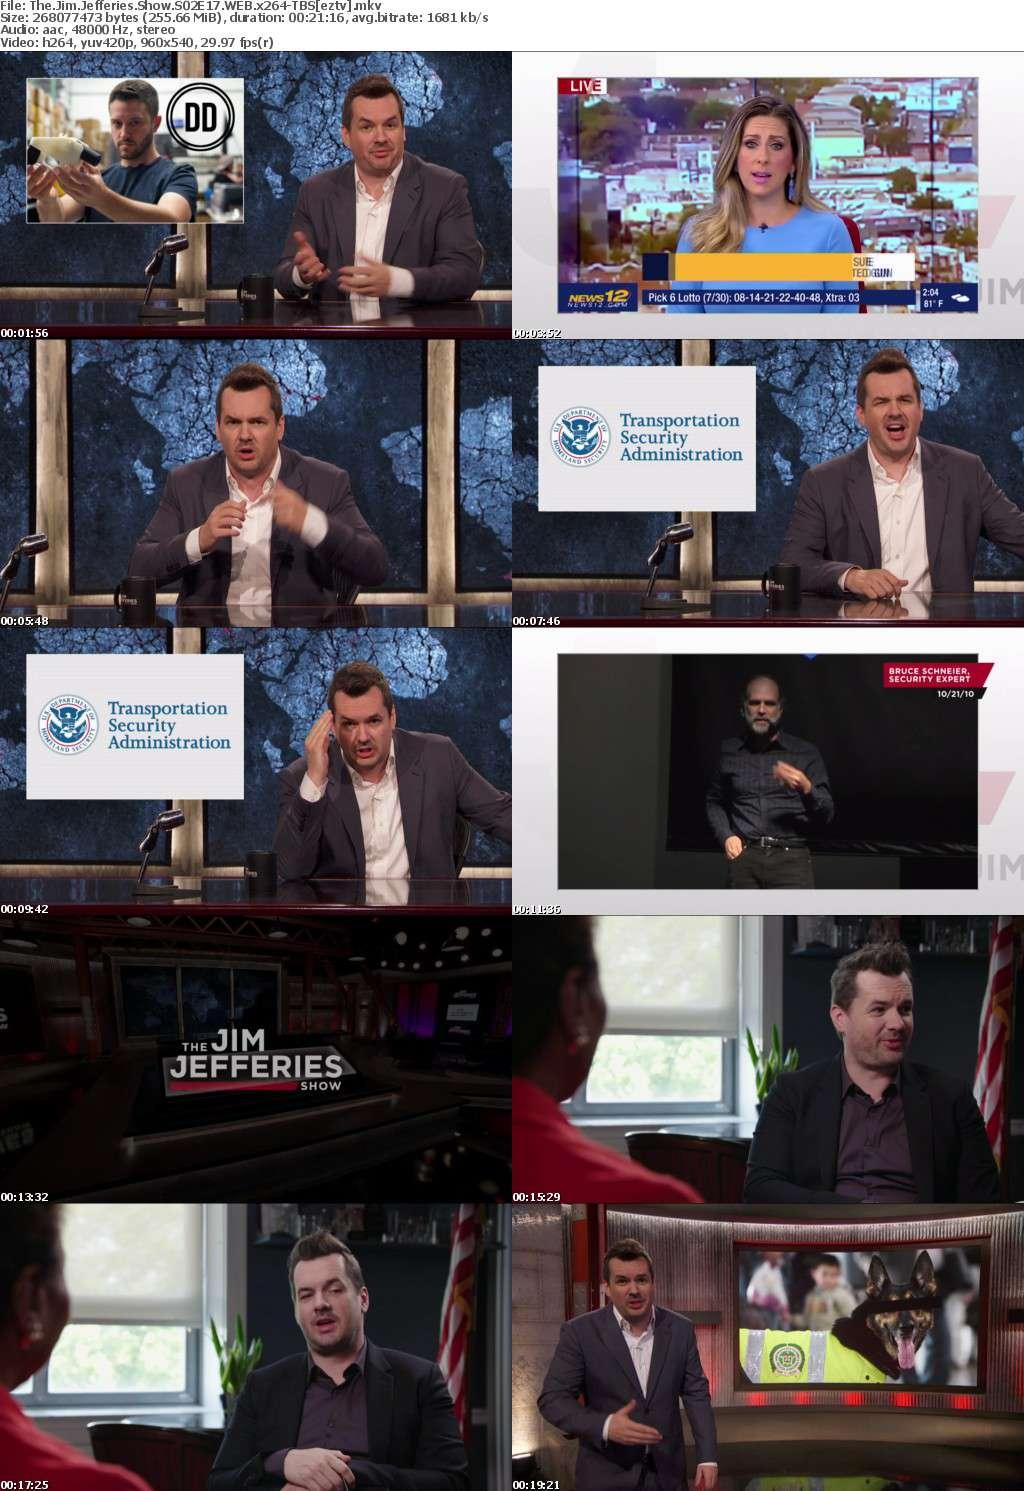 The Jim Jefferies Show S02E17 WEB x264-TBS